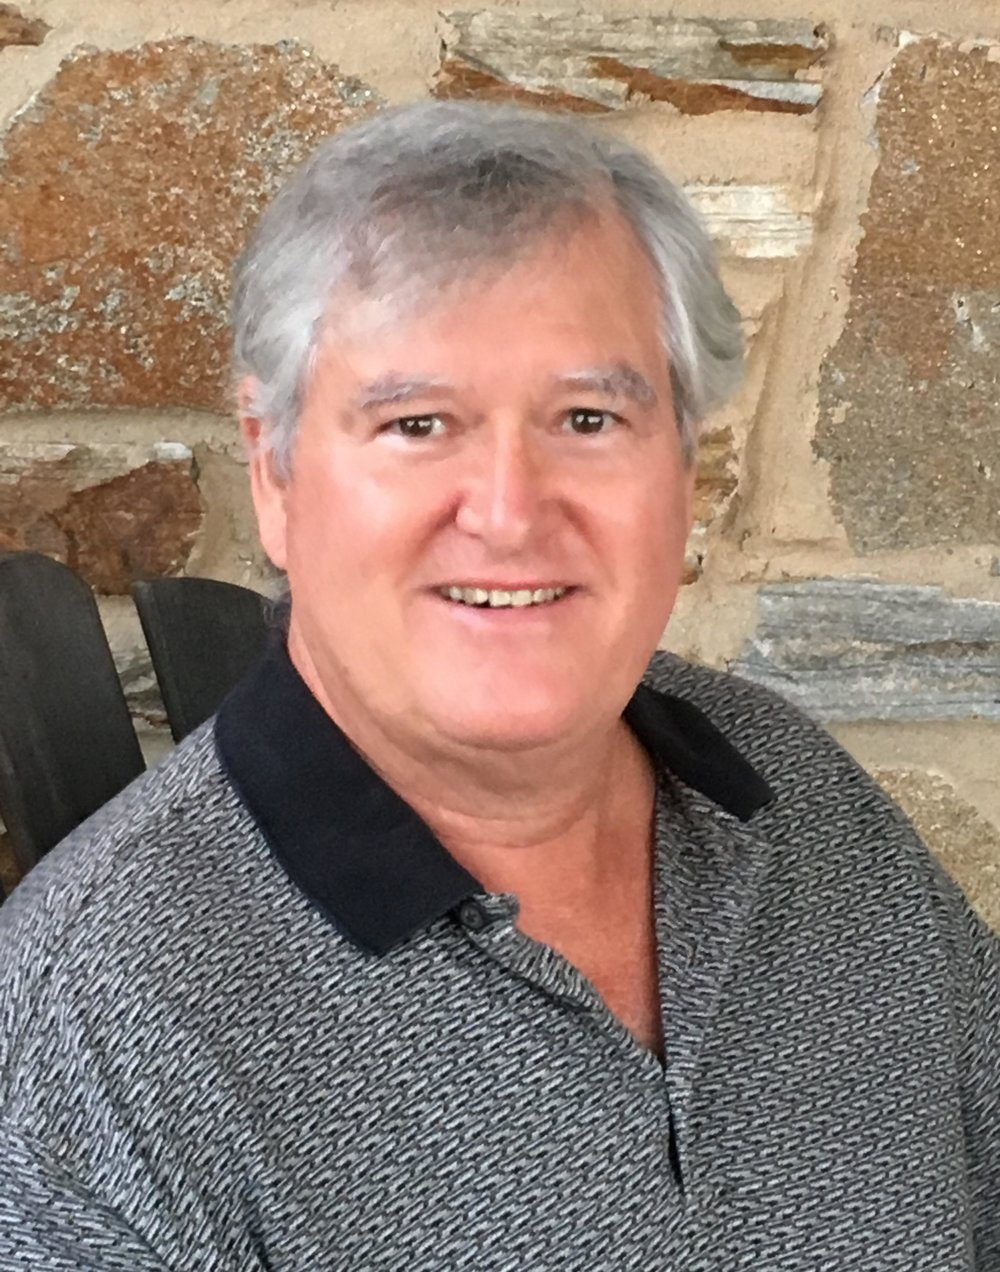 Michael H. O'Sullivan